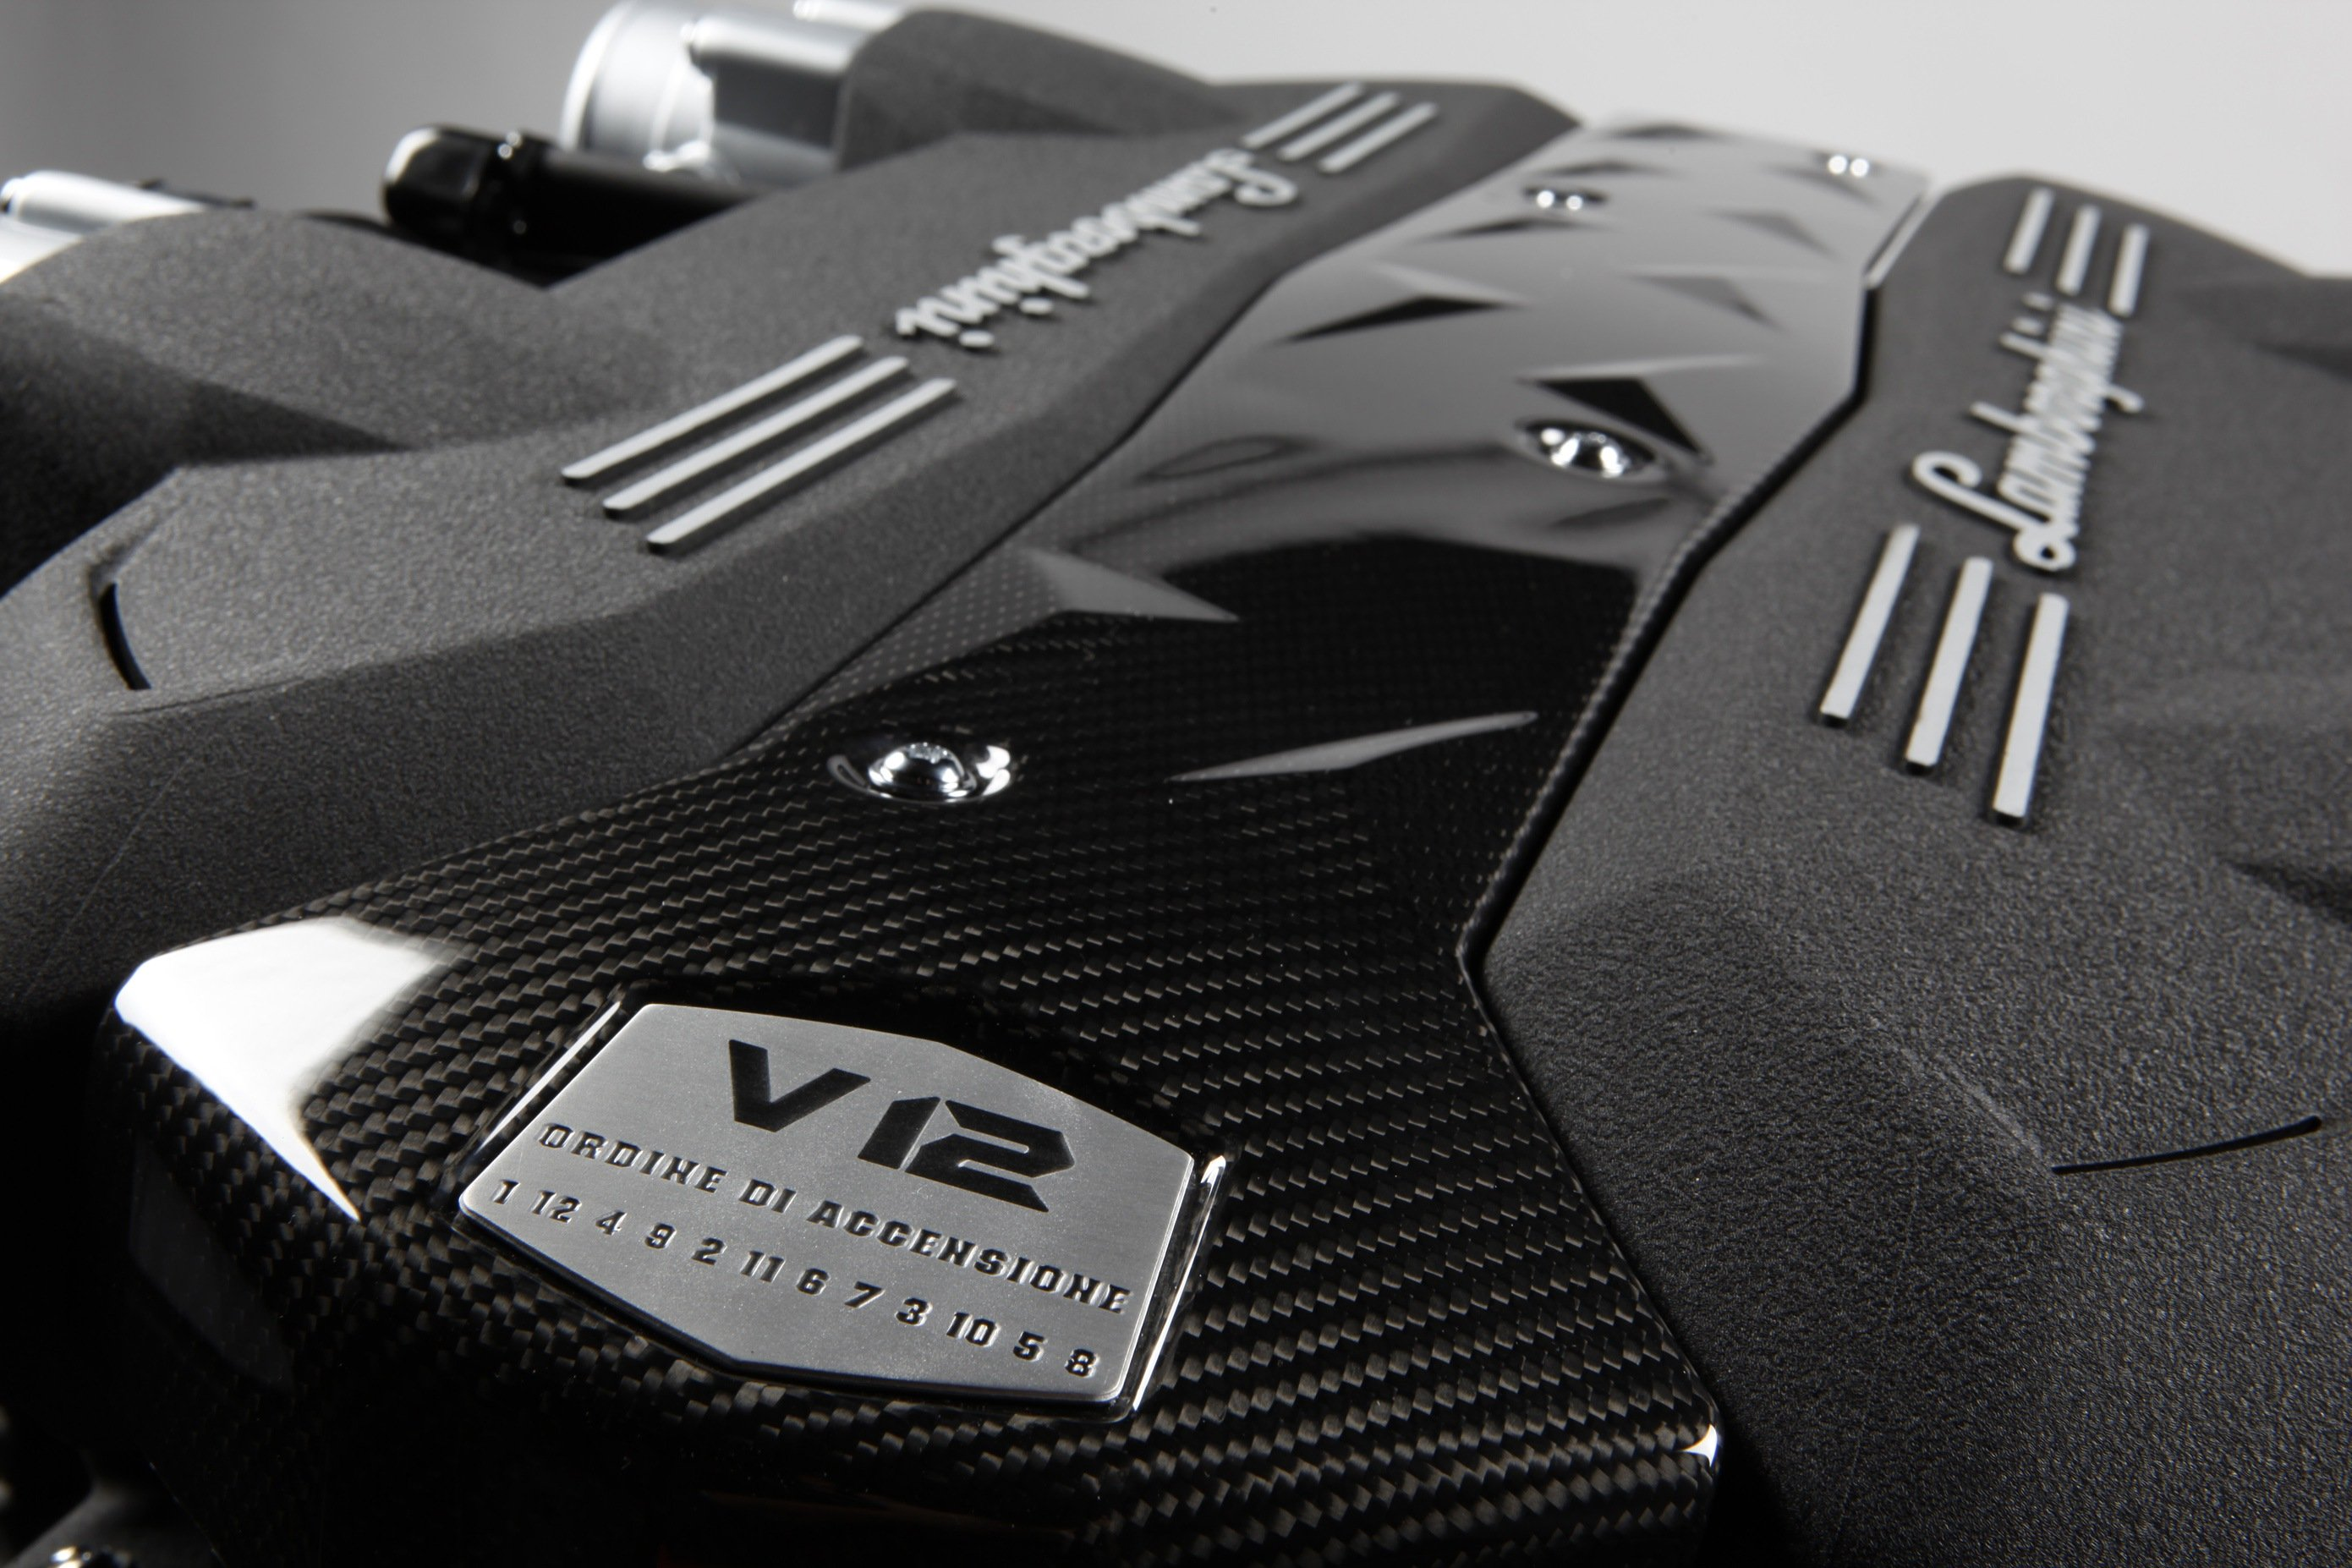 Lamborghini Aventador - V12 - badge